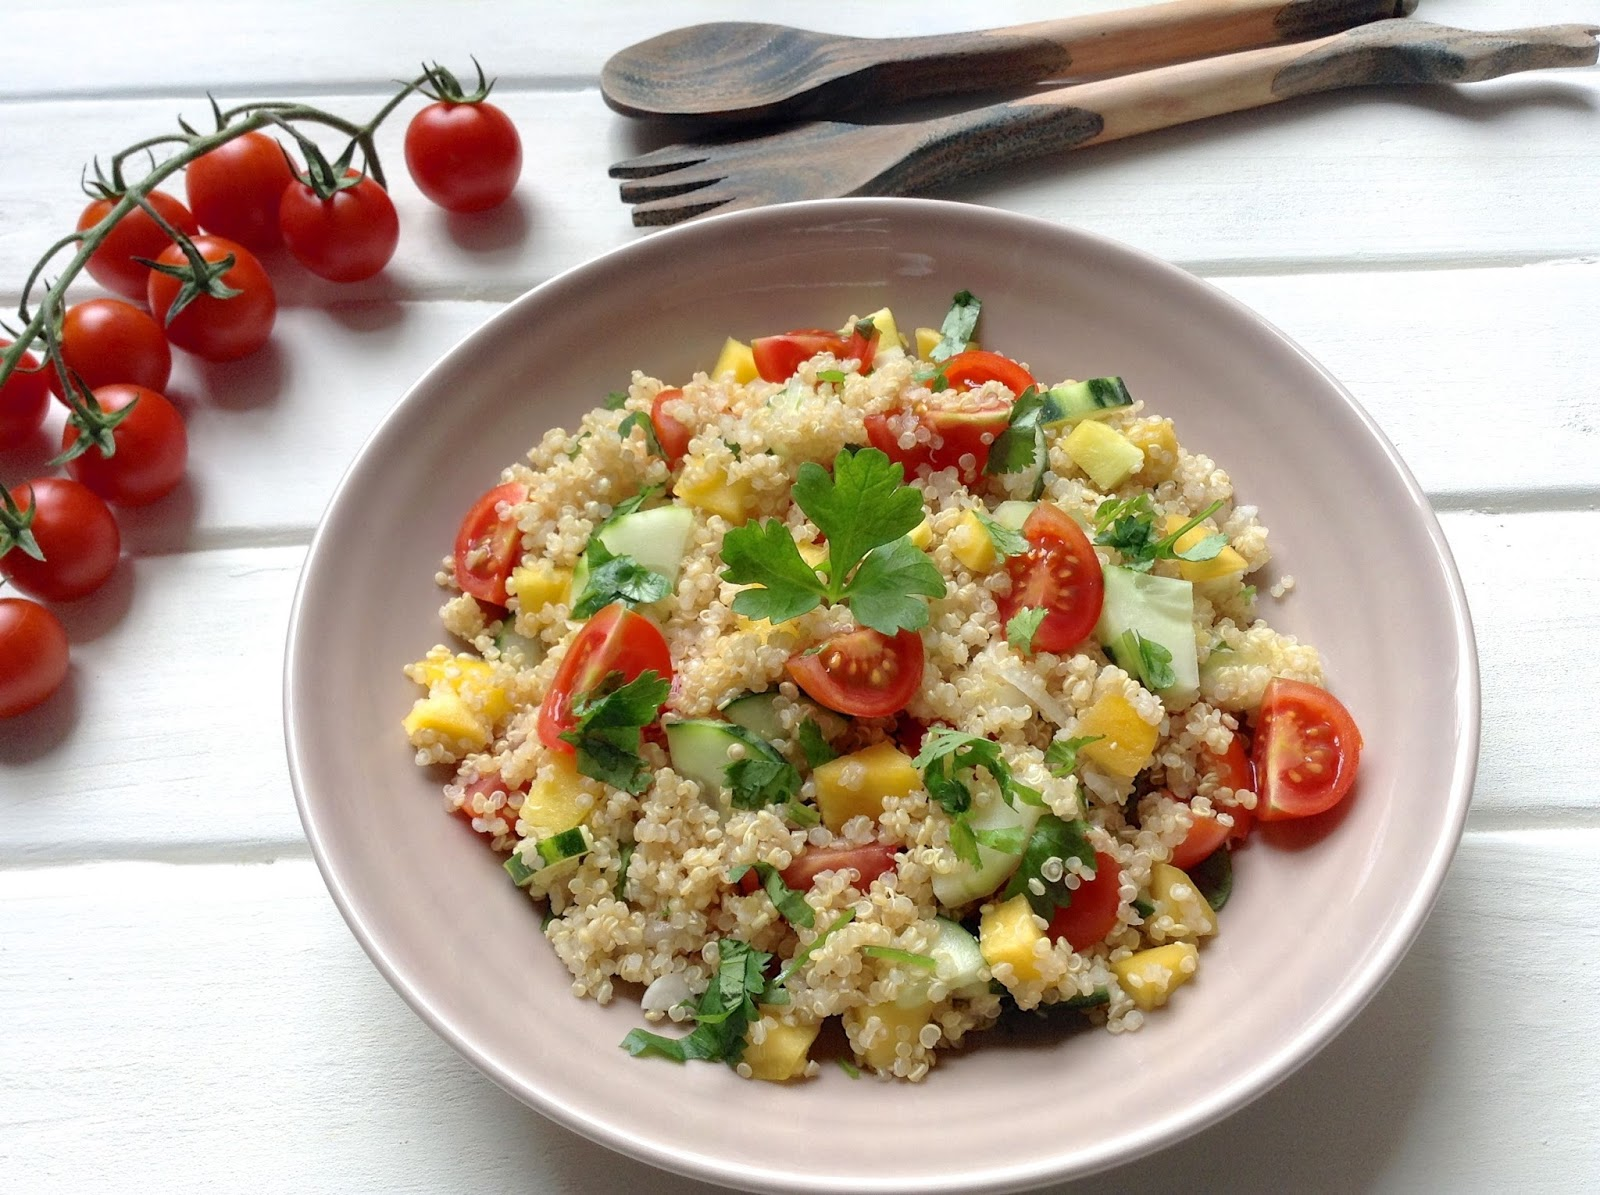 HOY COMEMOS SANO Ensalada vegetariana de Quinoa